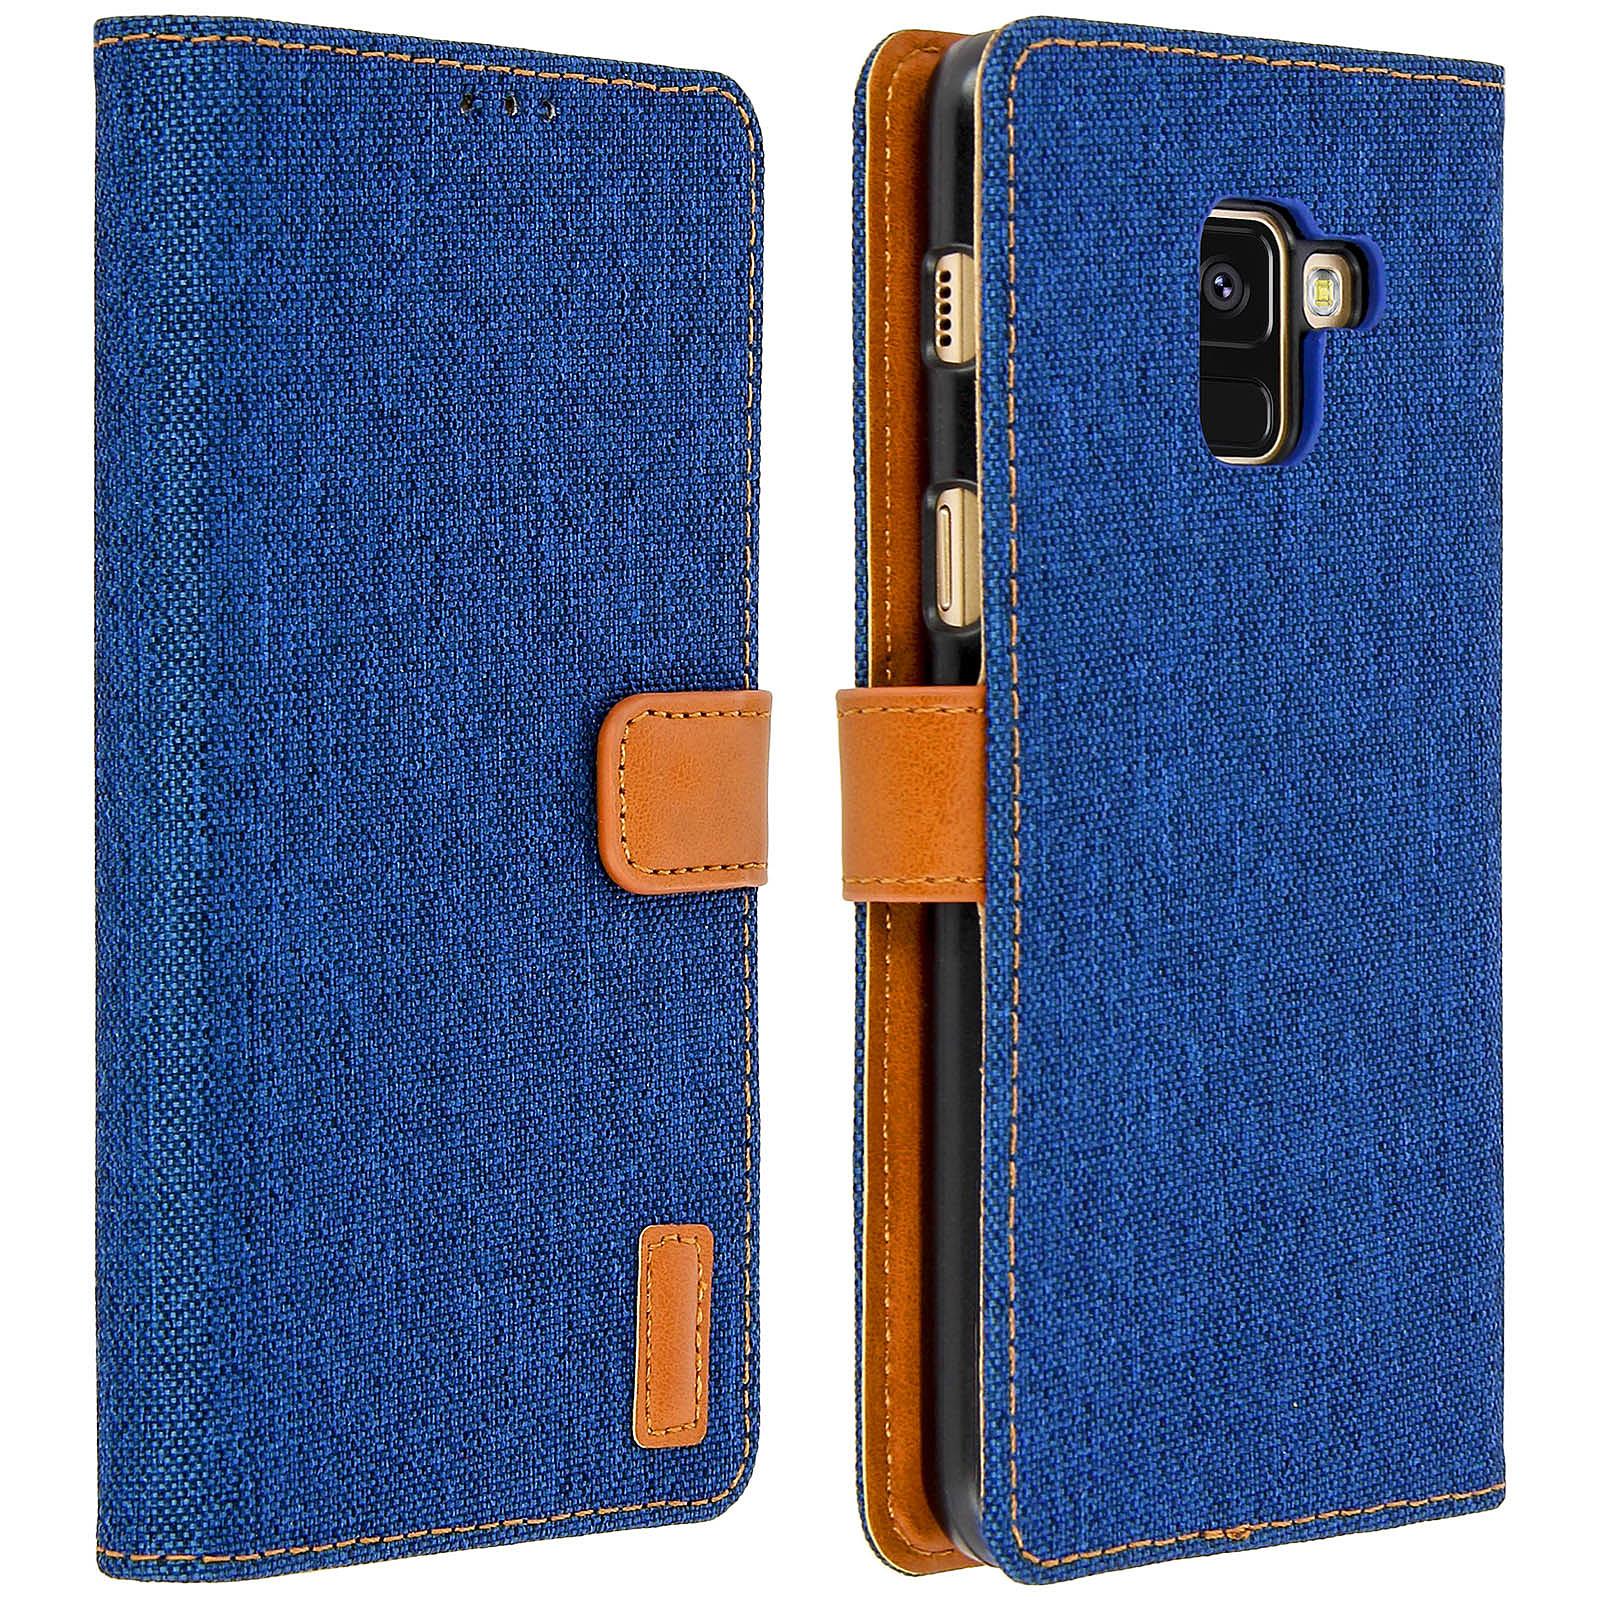 Avizar Etui folio Bleu pour Samsung Galaxy A8